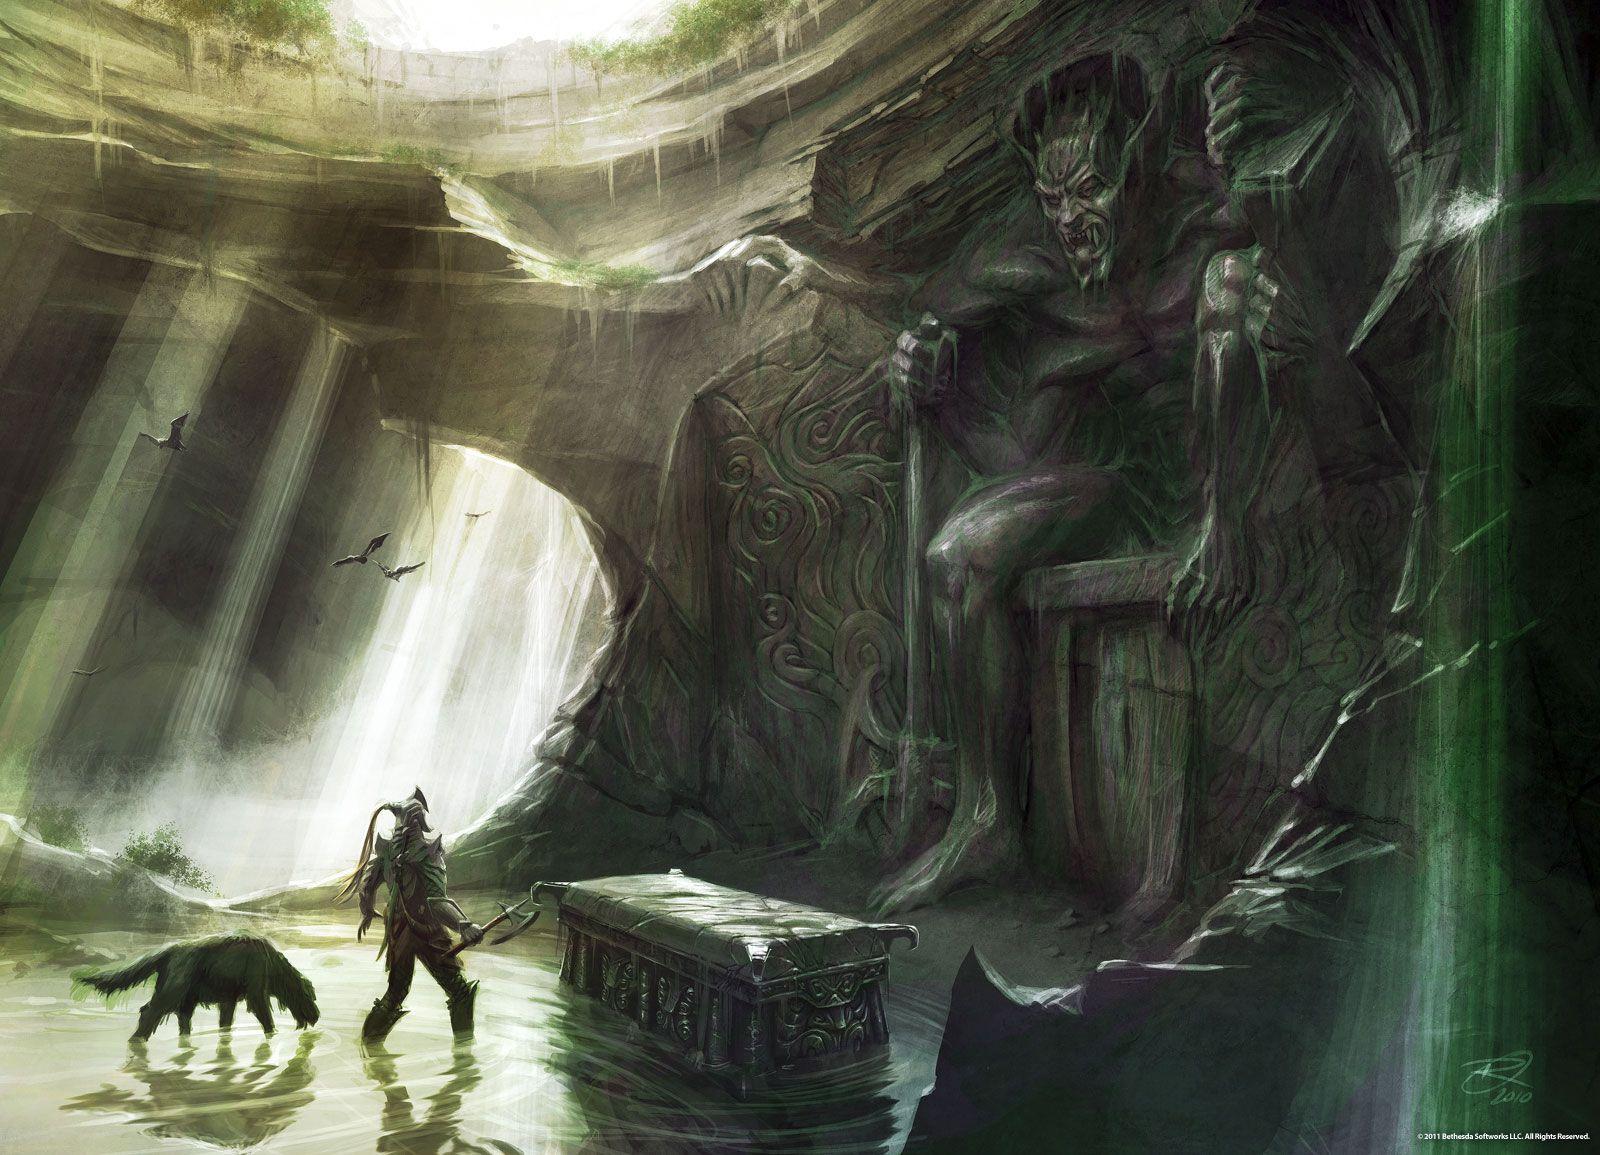 Elder Scrolls V Skyrim. Capilla de Mehrunes Vagon